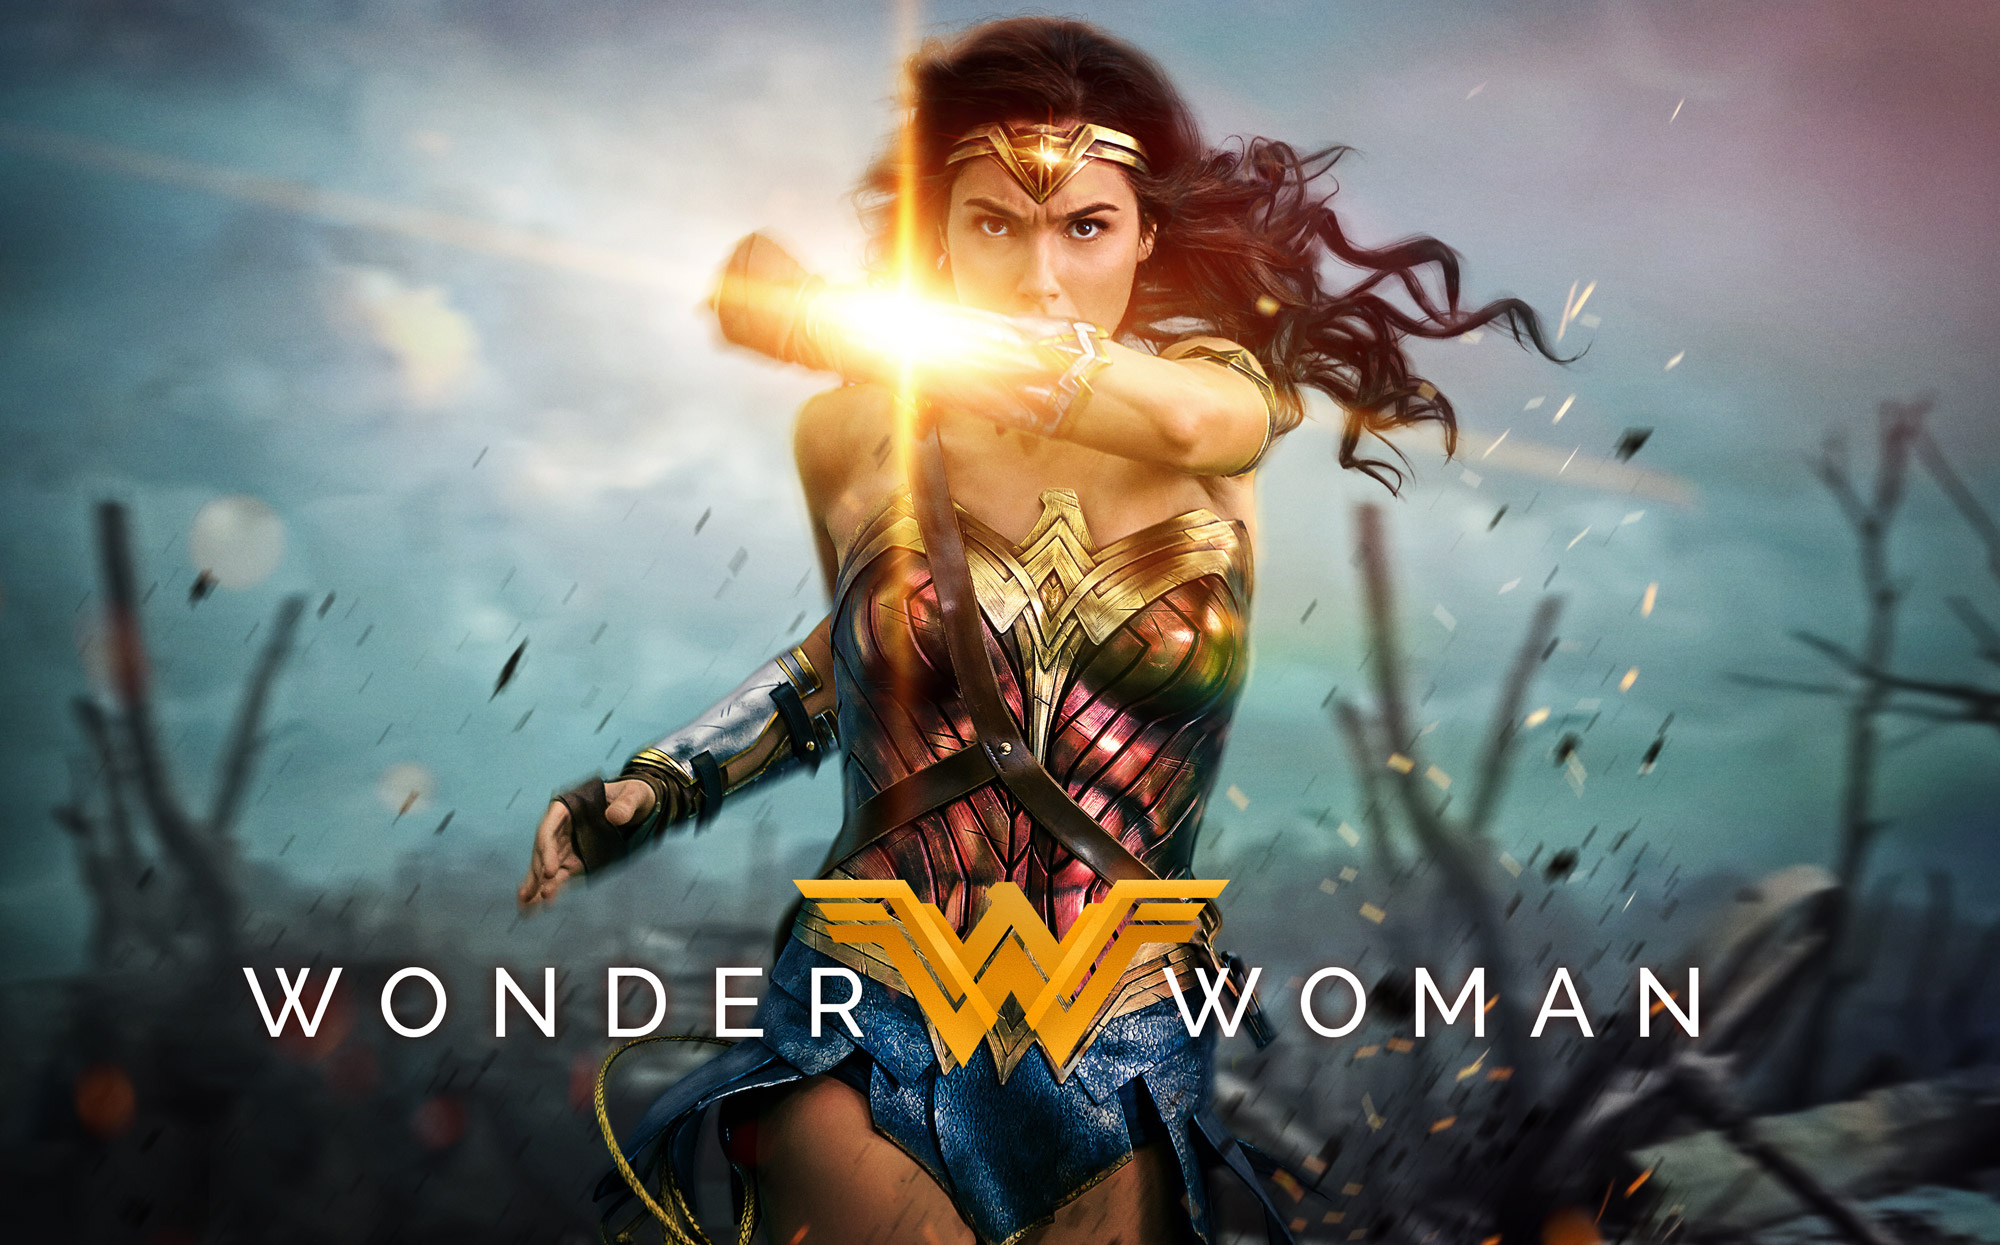 Wonder woman 2017 hd hd movies 4k wallpapers images - Wonder woman wallpaper ...